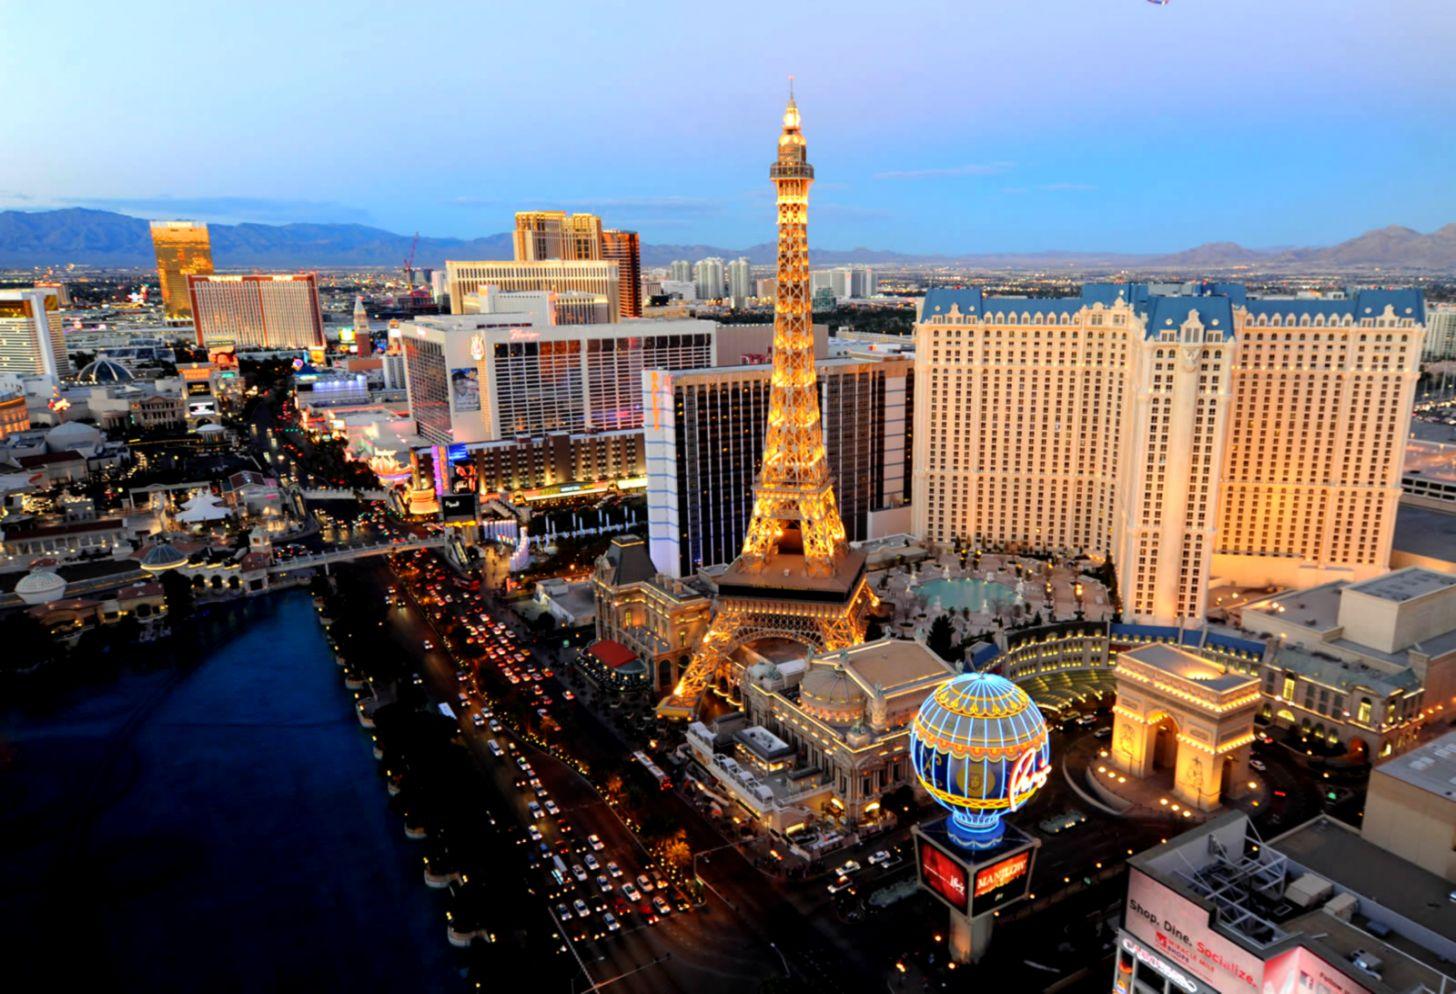 Las Vegas Hotel Paris Wallpaper All Hd Wallpapers Gallery